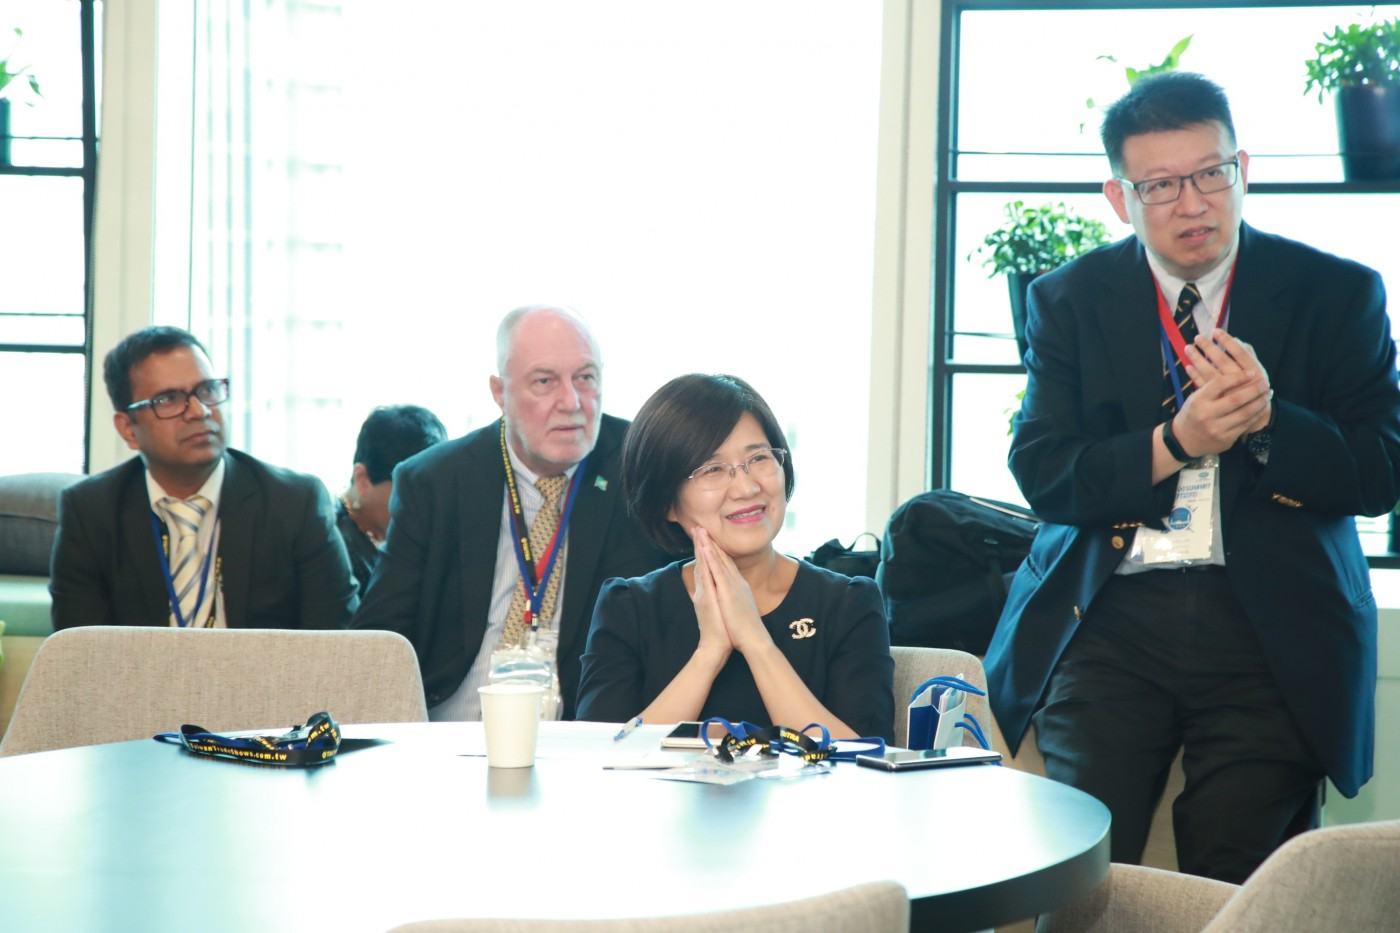 「APEC Startup Huddle」登場,在101「創聚雲」遇見台灣創新創業能量